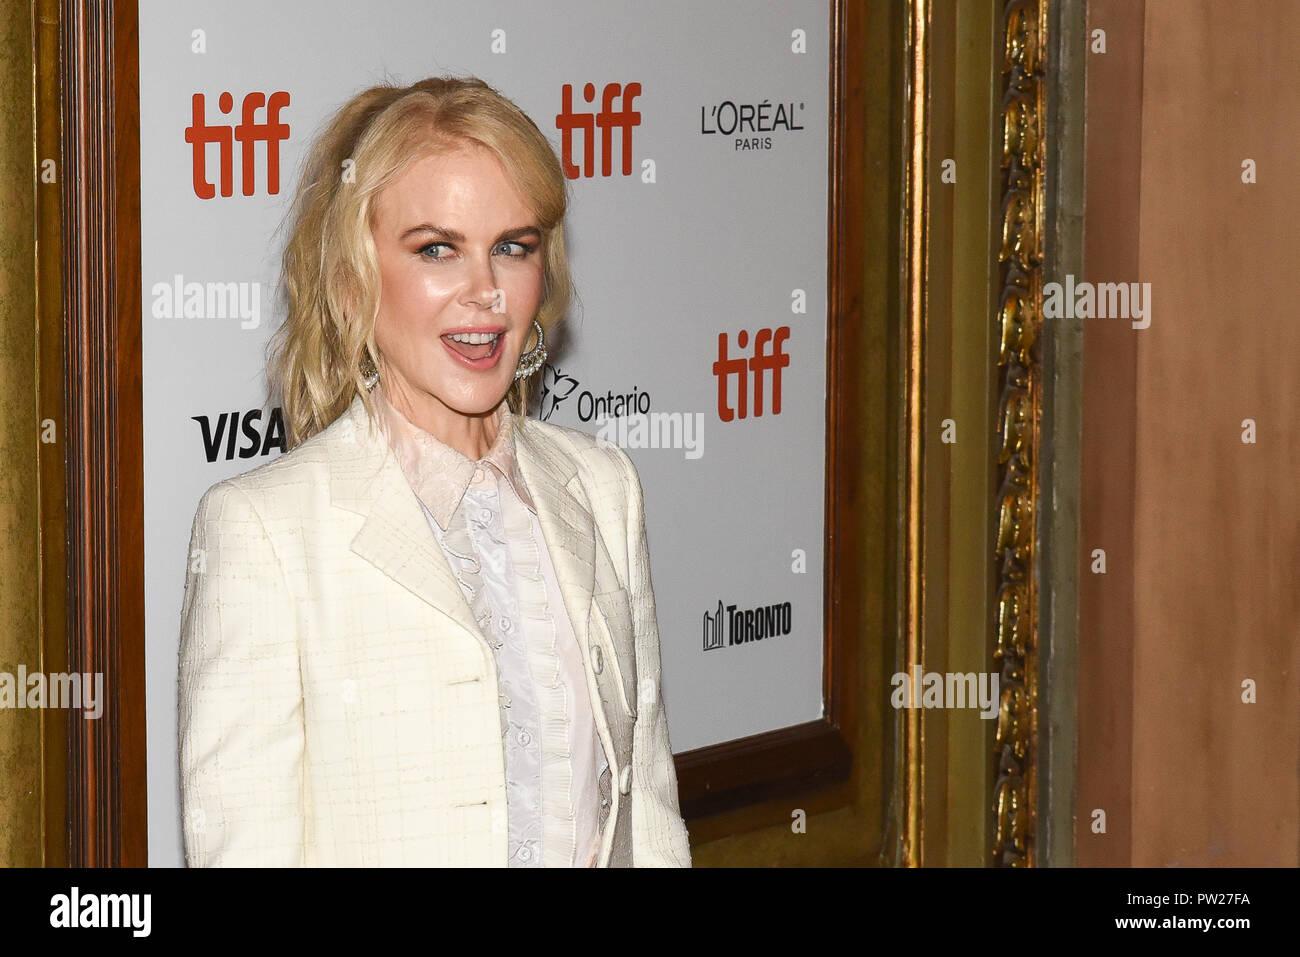 43rd Toronto International Film Festival - Destroyer - Premiere  Featuring: Nicole Kidman Where: Toronto, Canada When: 10 Sep 2018 Credit: Jaime Espinoza/WENN.com Stock Photo